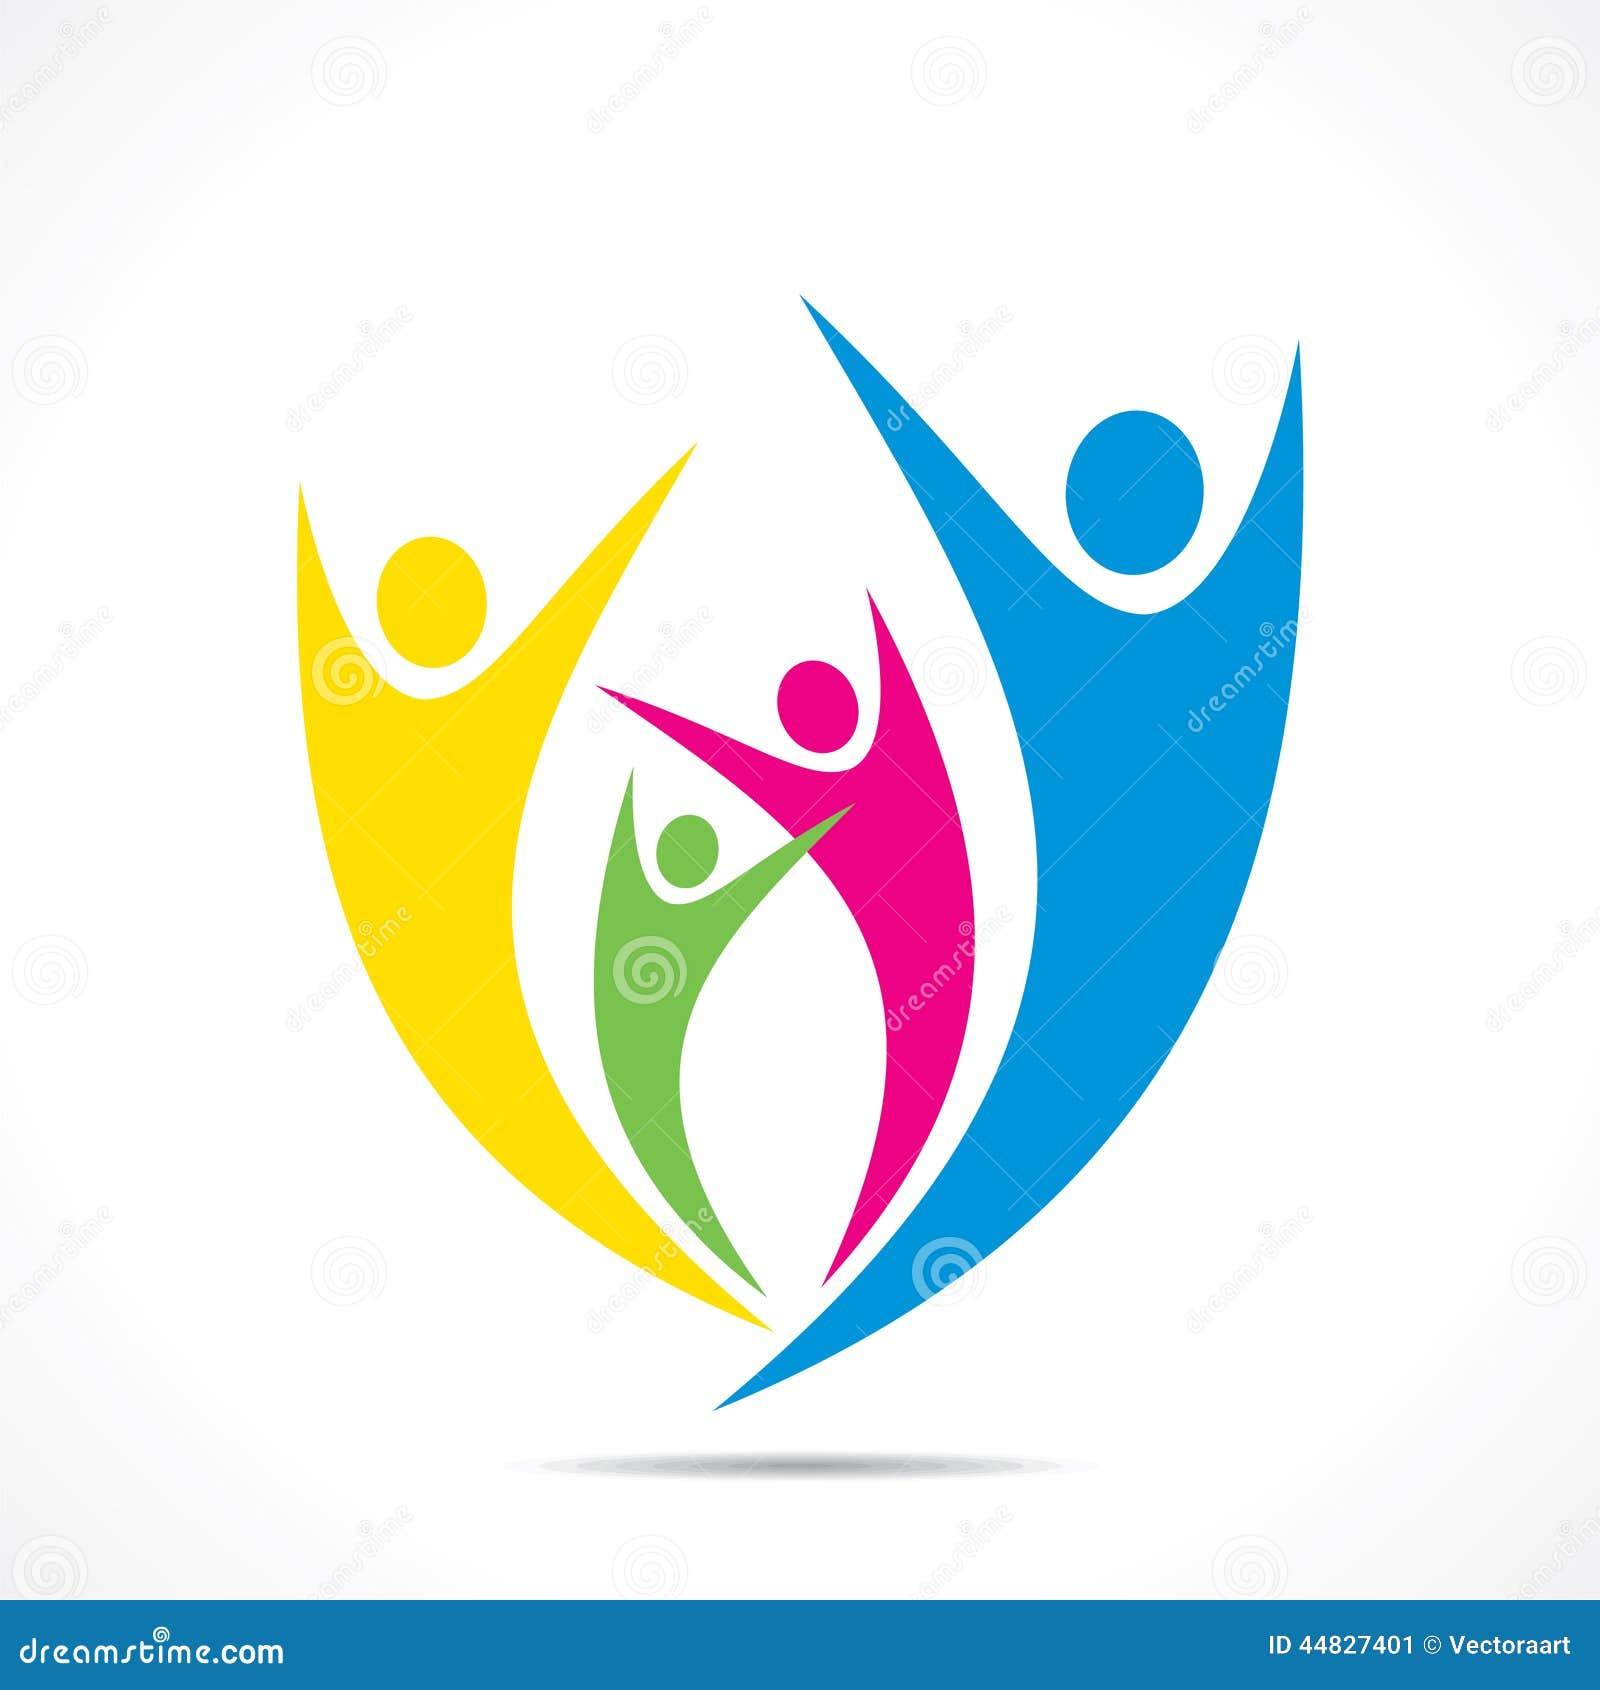 Creative Colorful Enjoy Or Celebration Icon Design Stock Vector ...